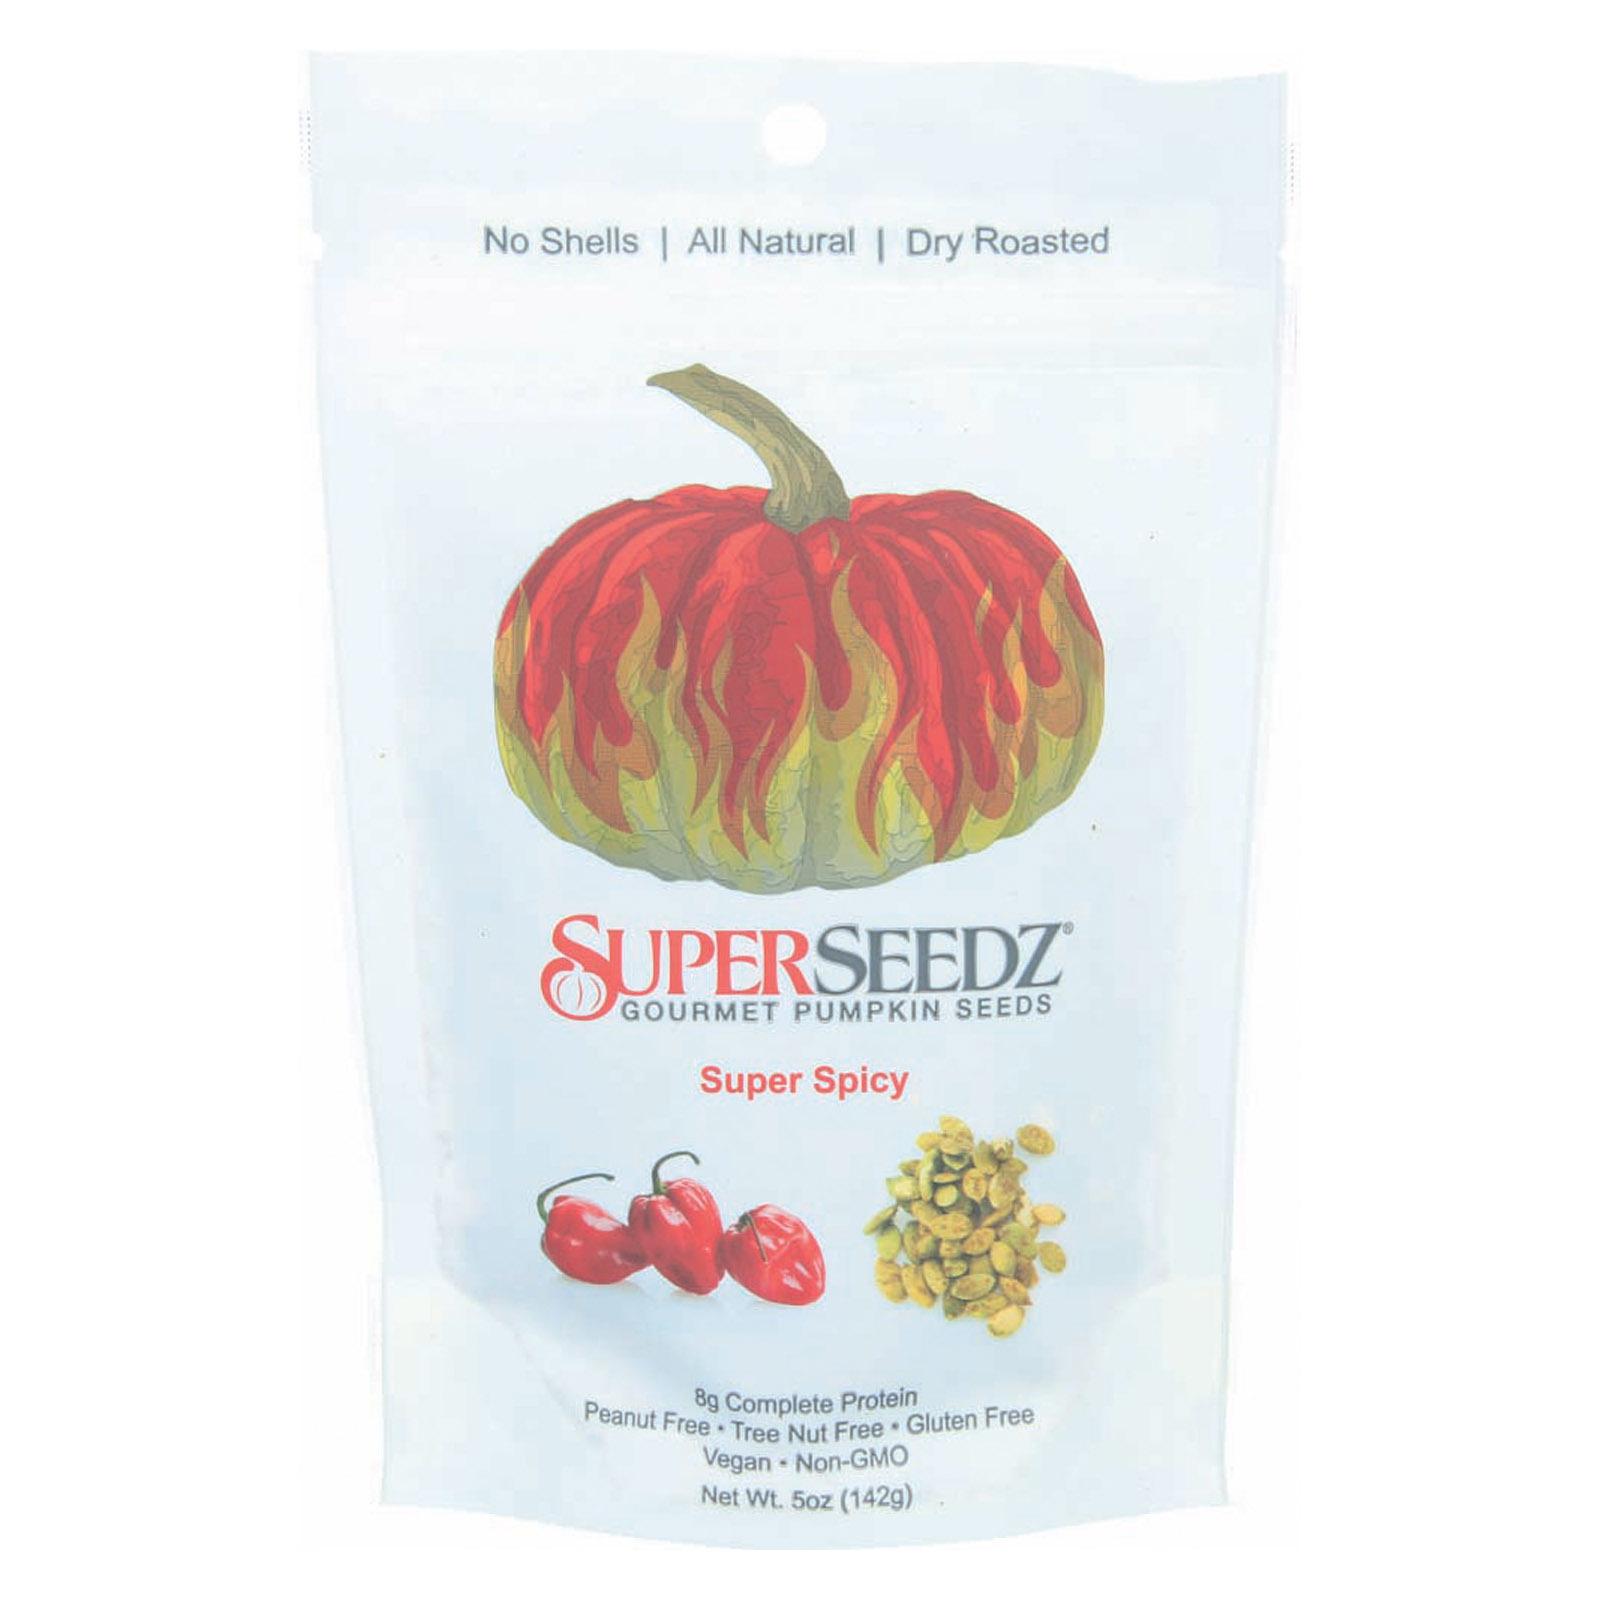 Superseedz Gourmet Pumpkin Seeds - Super Spicy - Case of 6 - 5 oz.